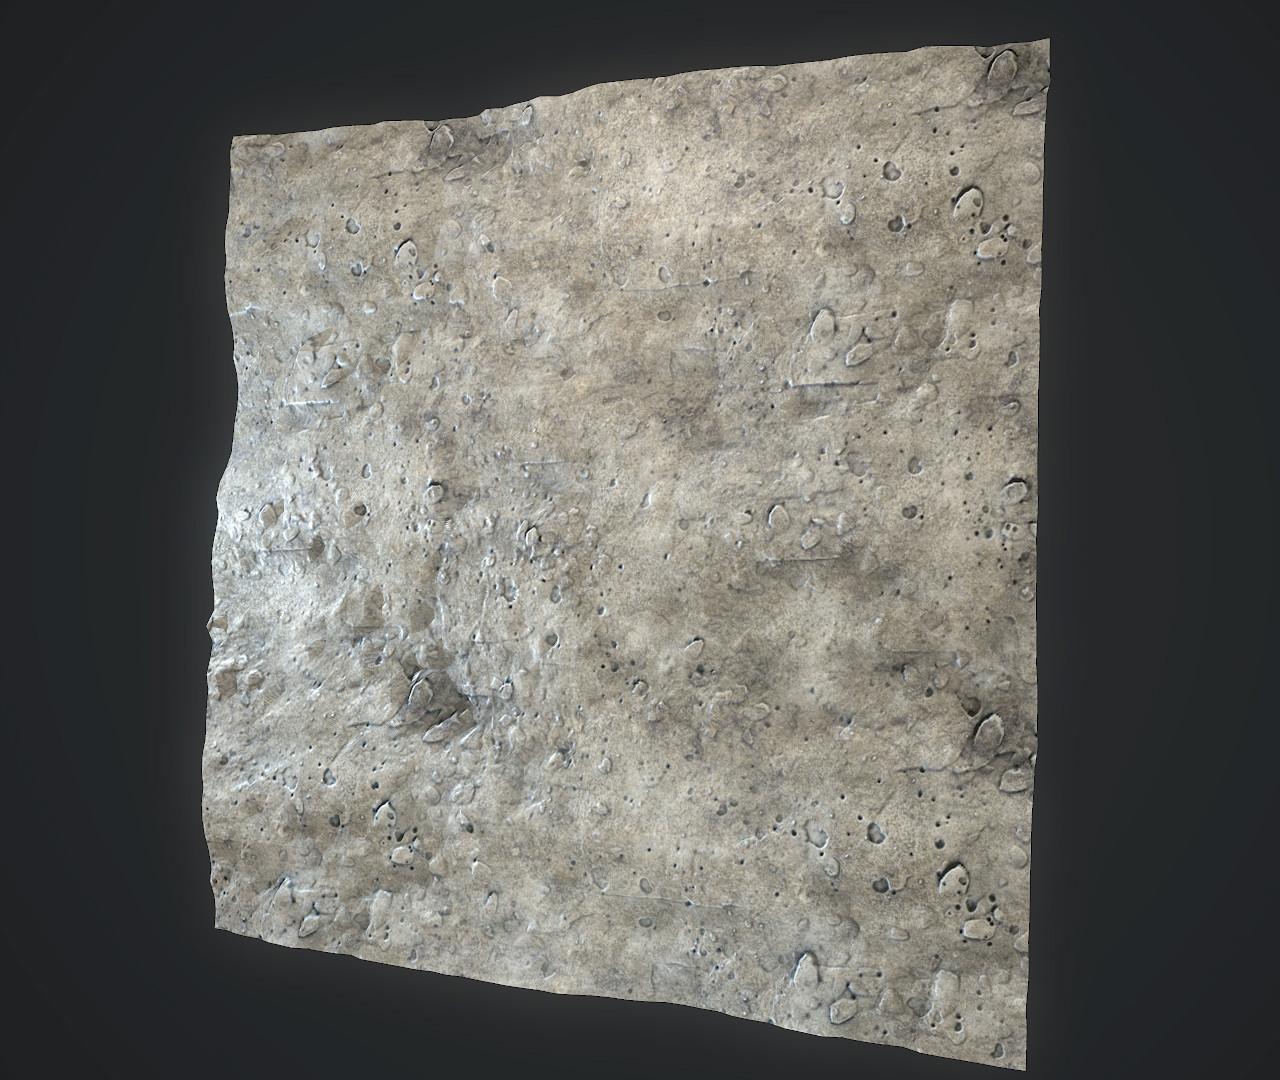 Pawel margacz concrete